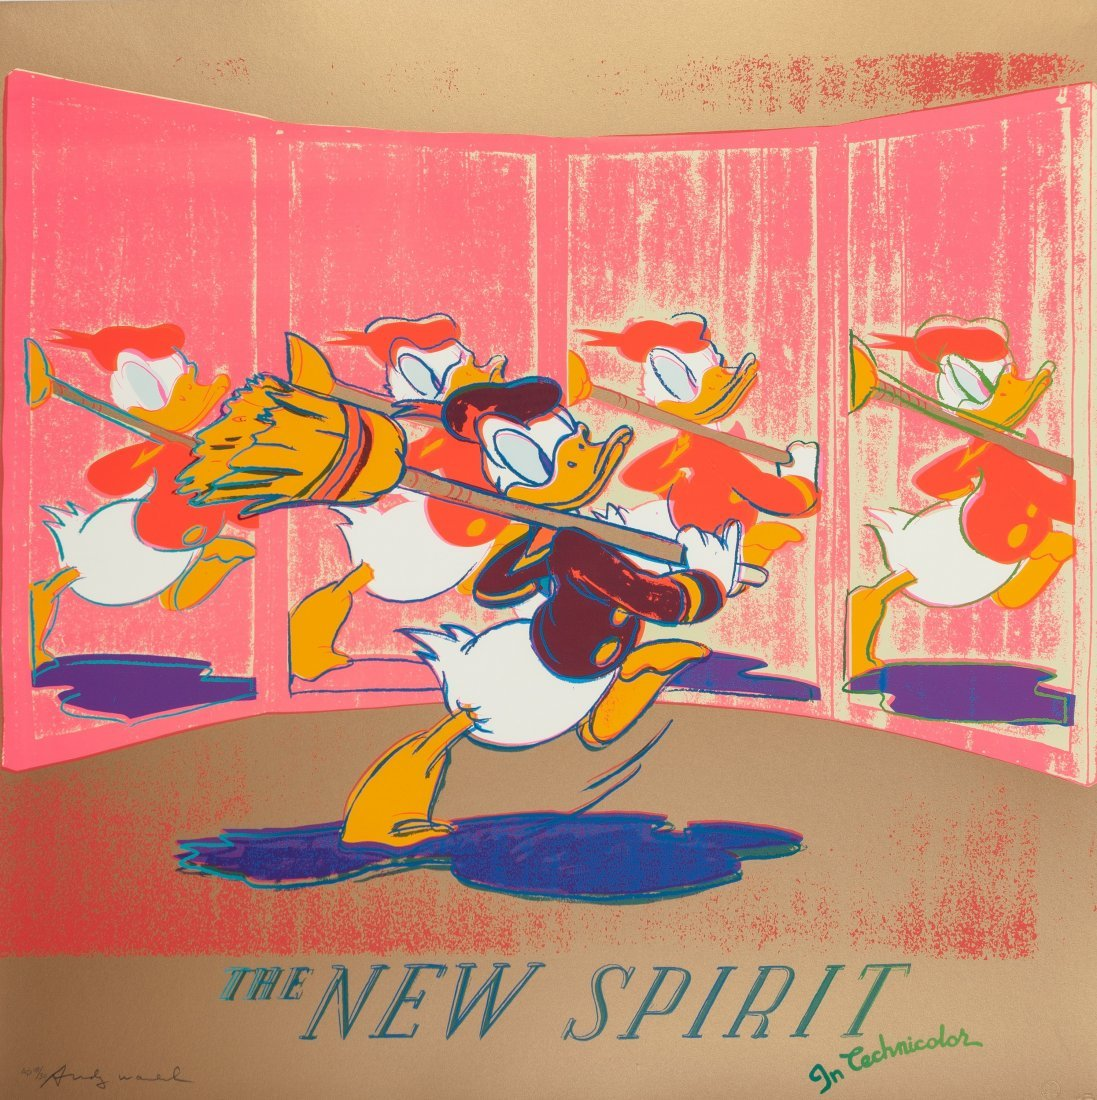 77211: Andy Warhol (1928-1987) The New Spirit (Donald D